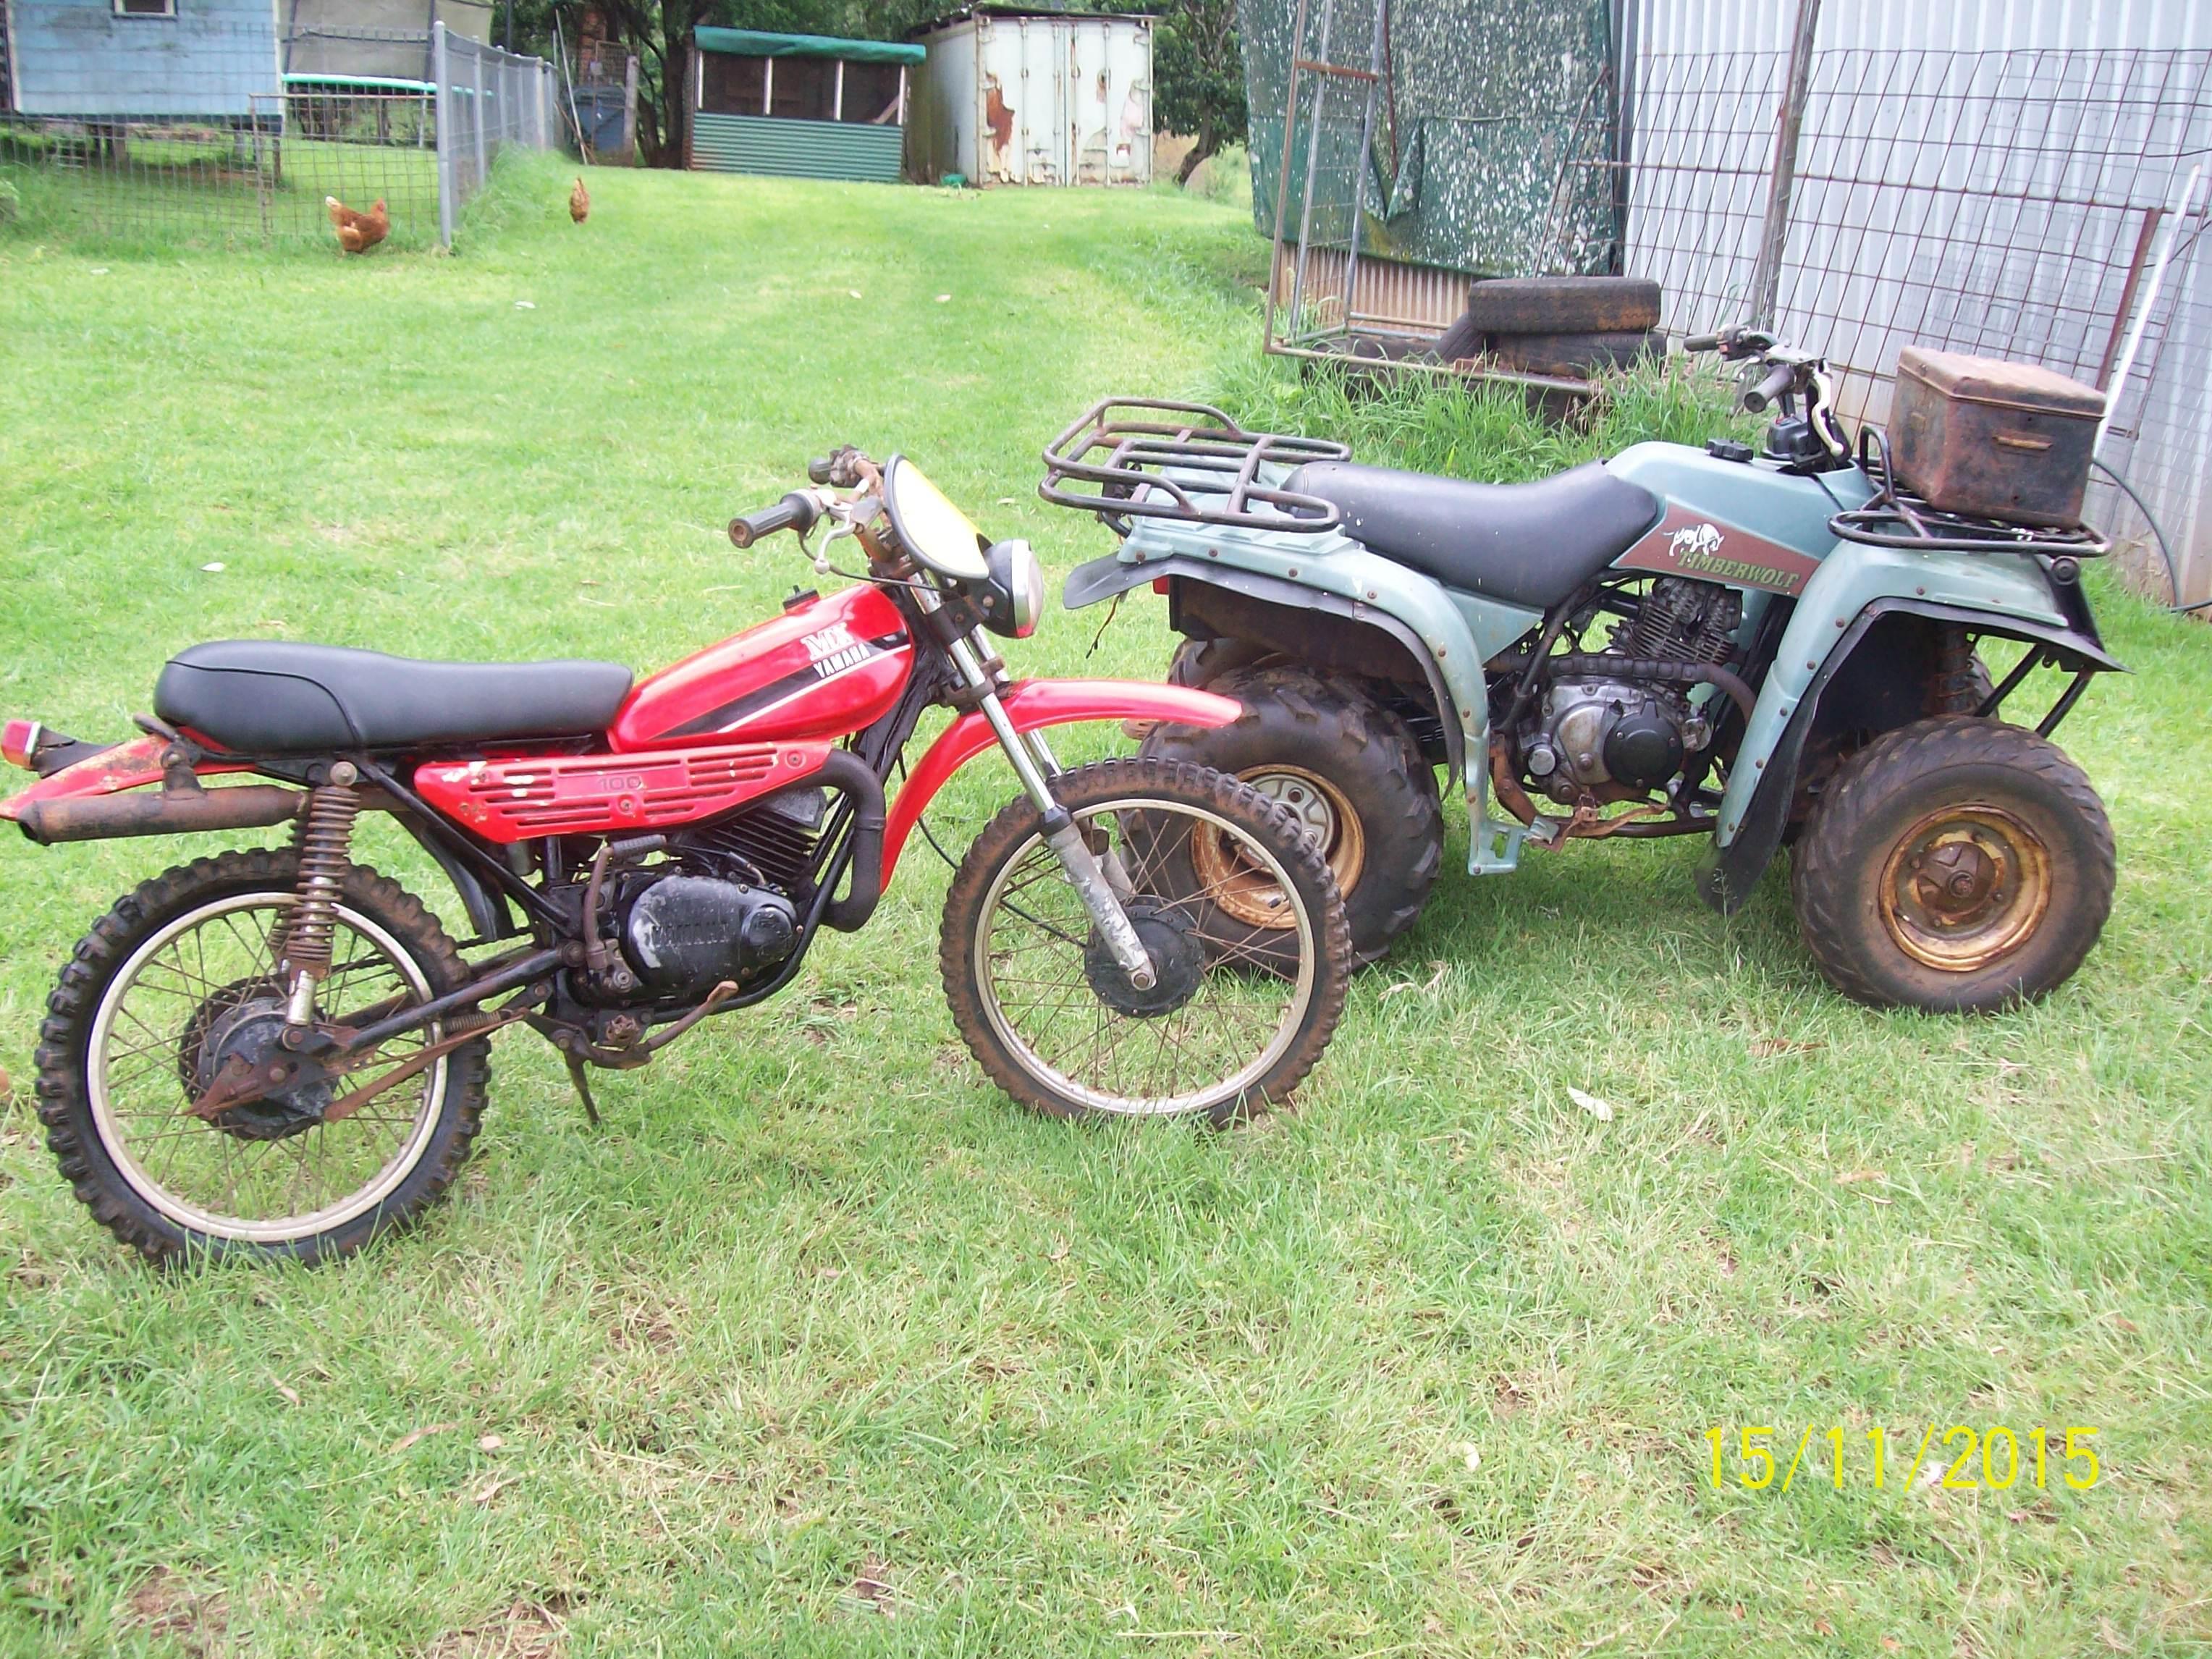 YAMAHA TIMBER WOLF 230 2WD GOOD COND GOES WELL $ 550 YAMAHA MX 100 GOES WELL $ 200